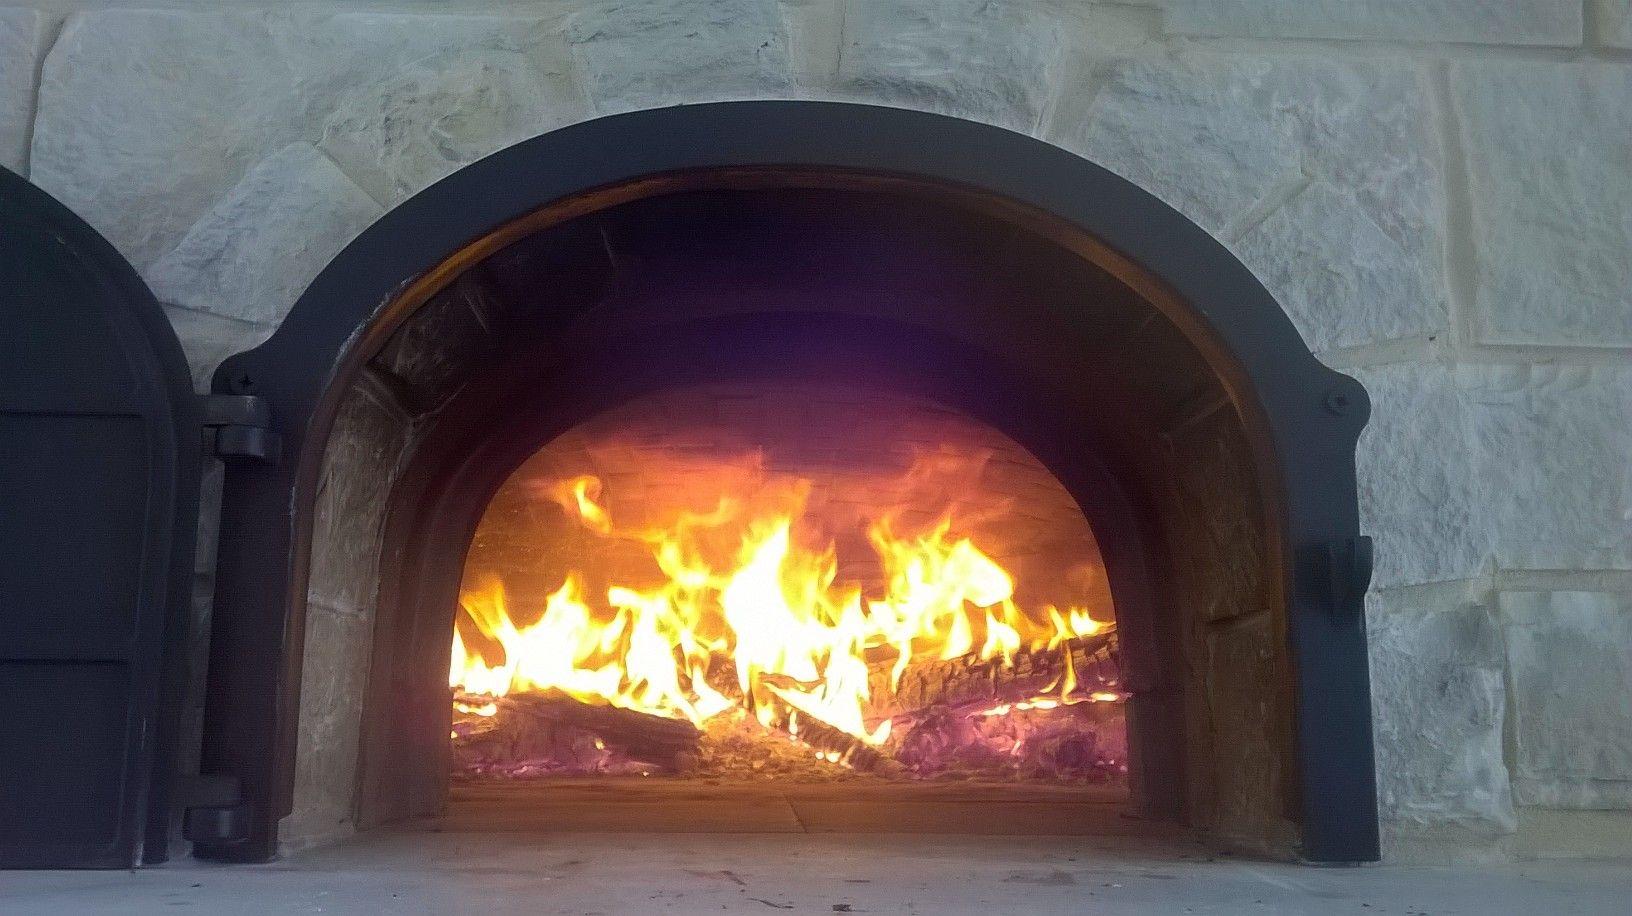 Burn baby burn  #fire, #brickoven, #stone, #outdoorkitchen, #wood, #castiron, #woodfired,